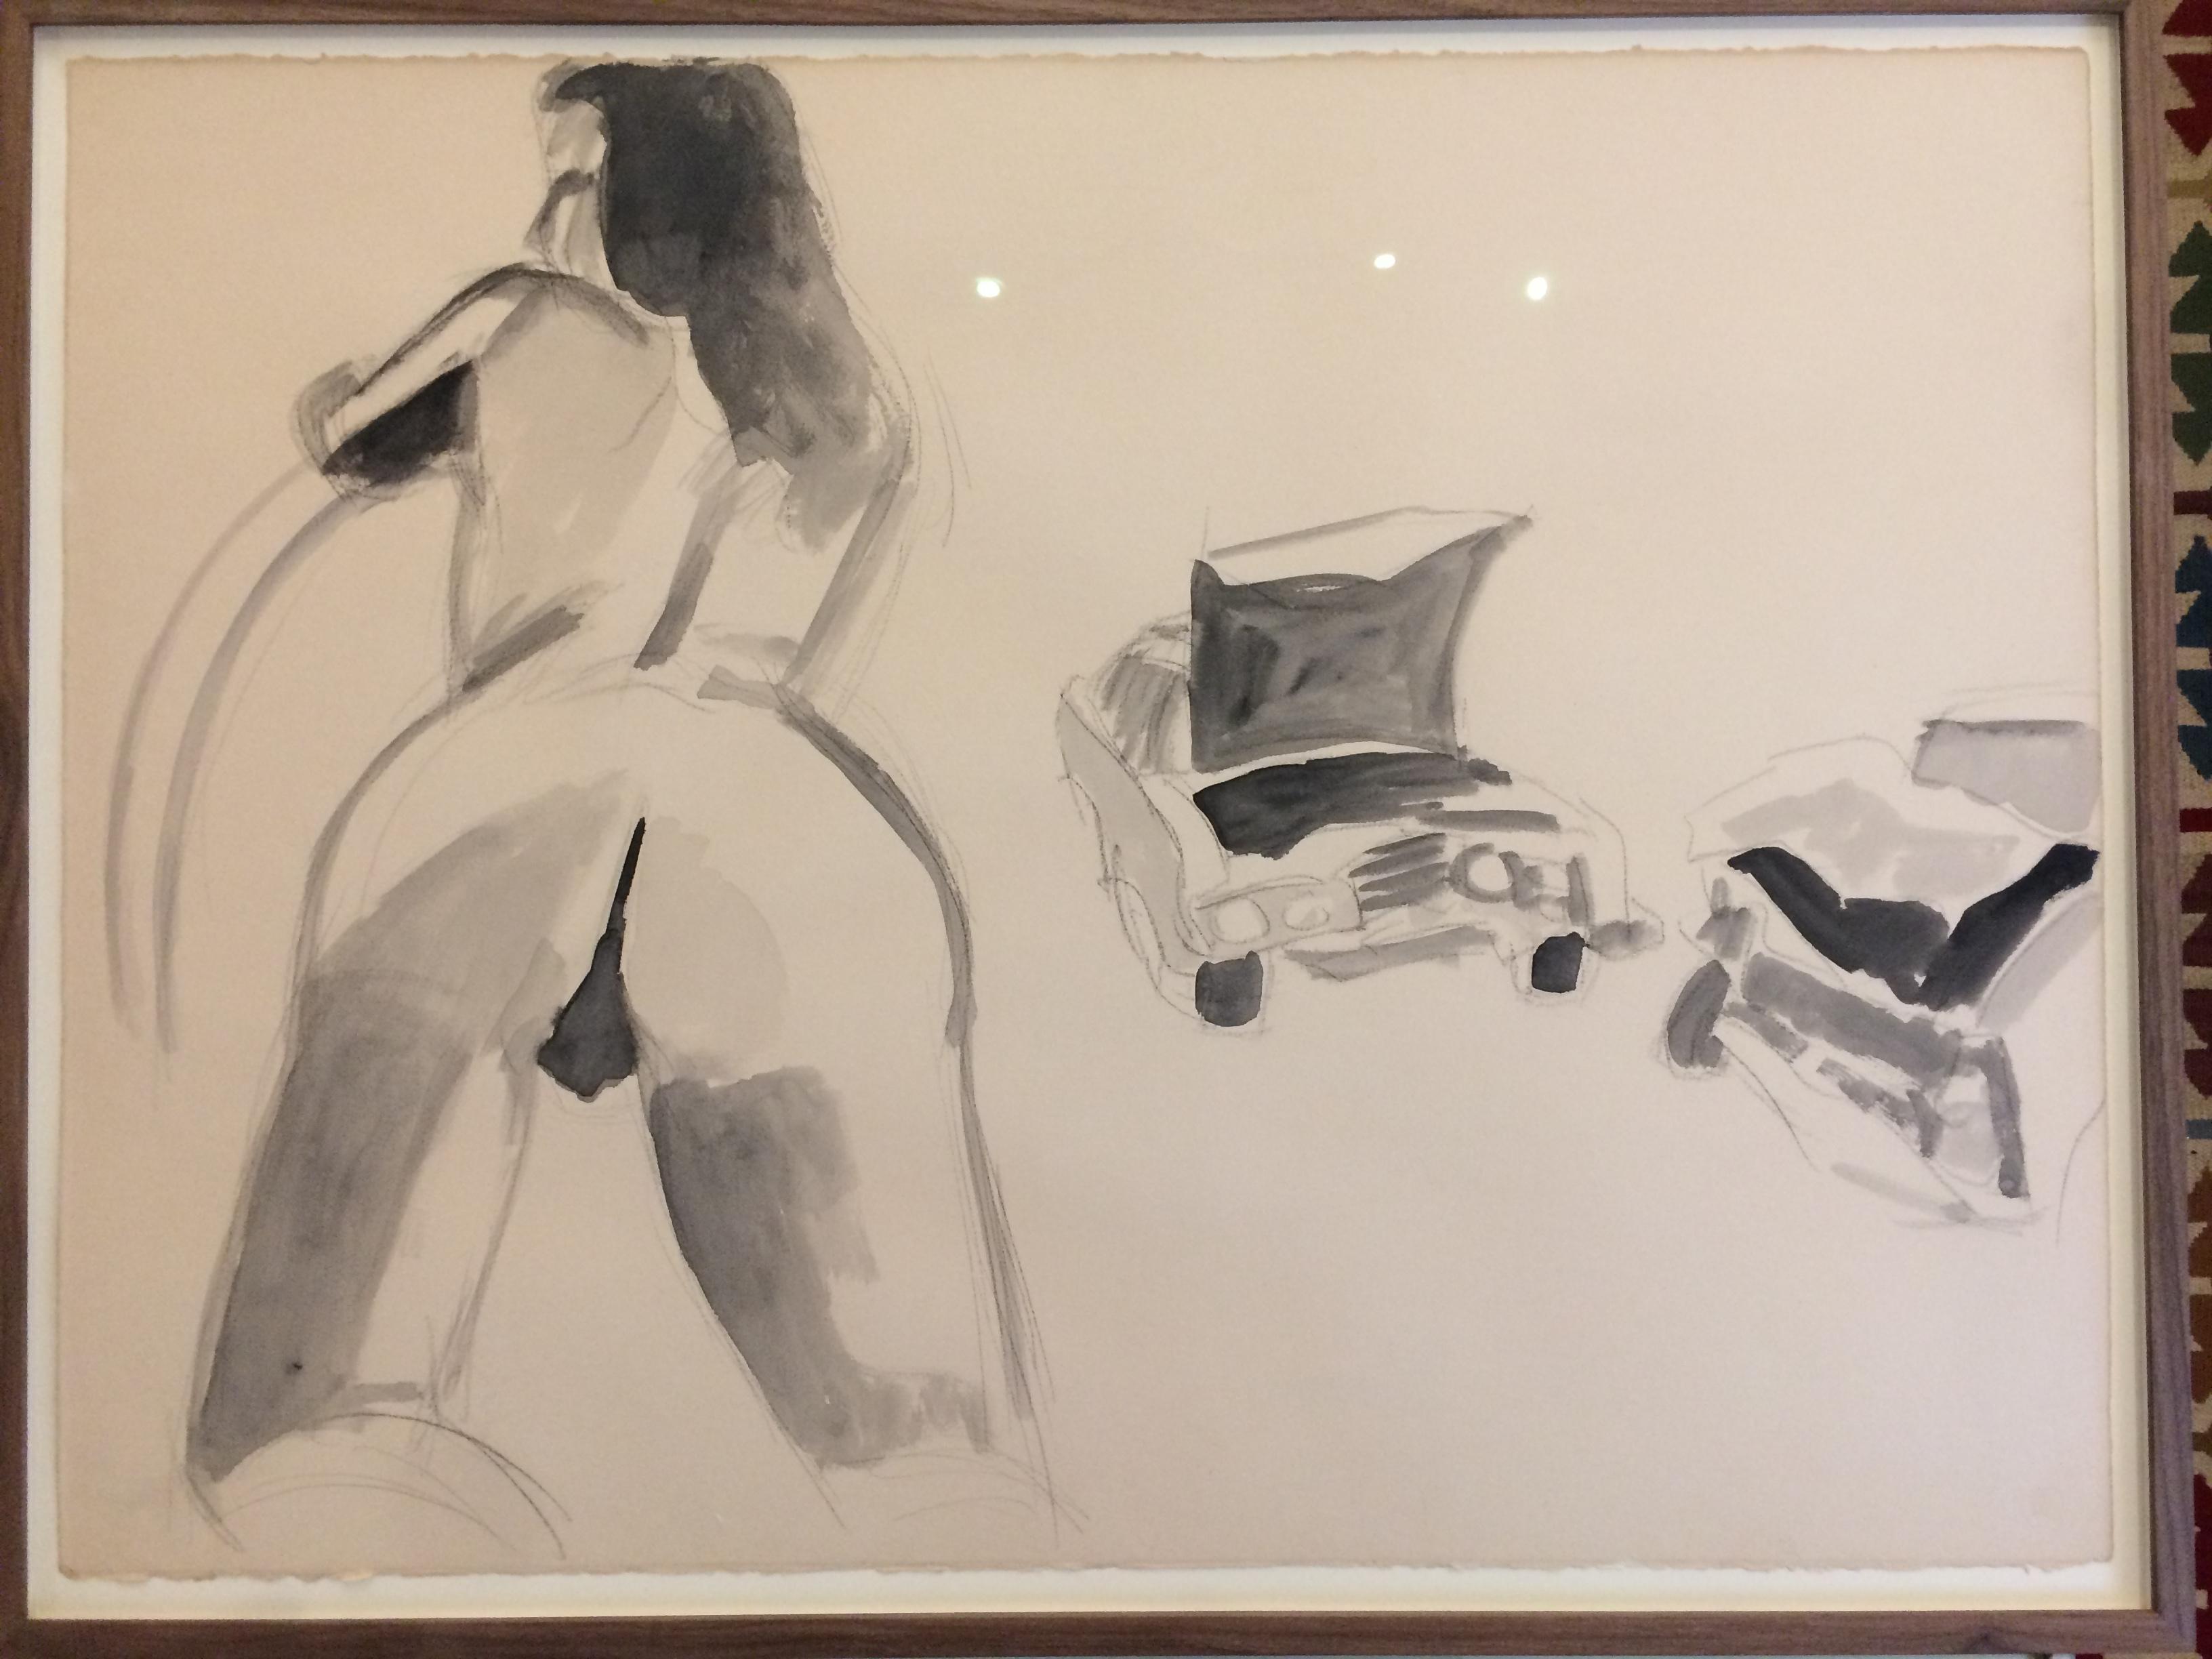 DAVID SALLE  (1952)ZONDER TITEL( carcrash-serie 1977/78)